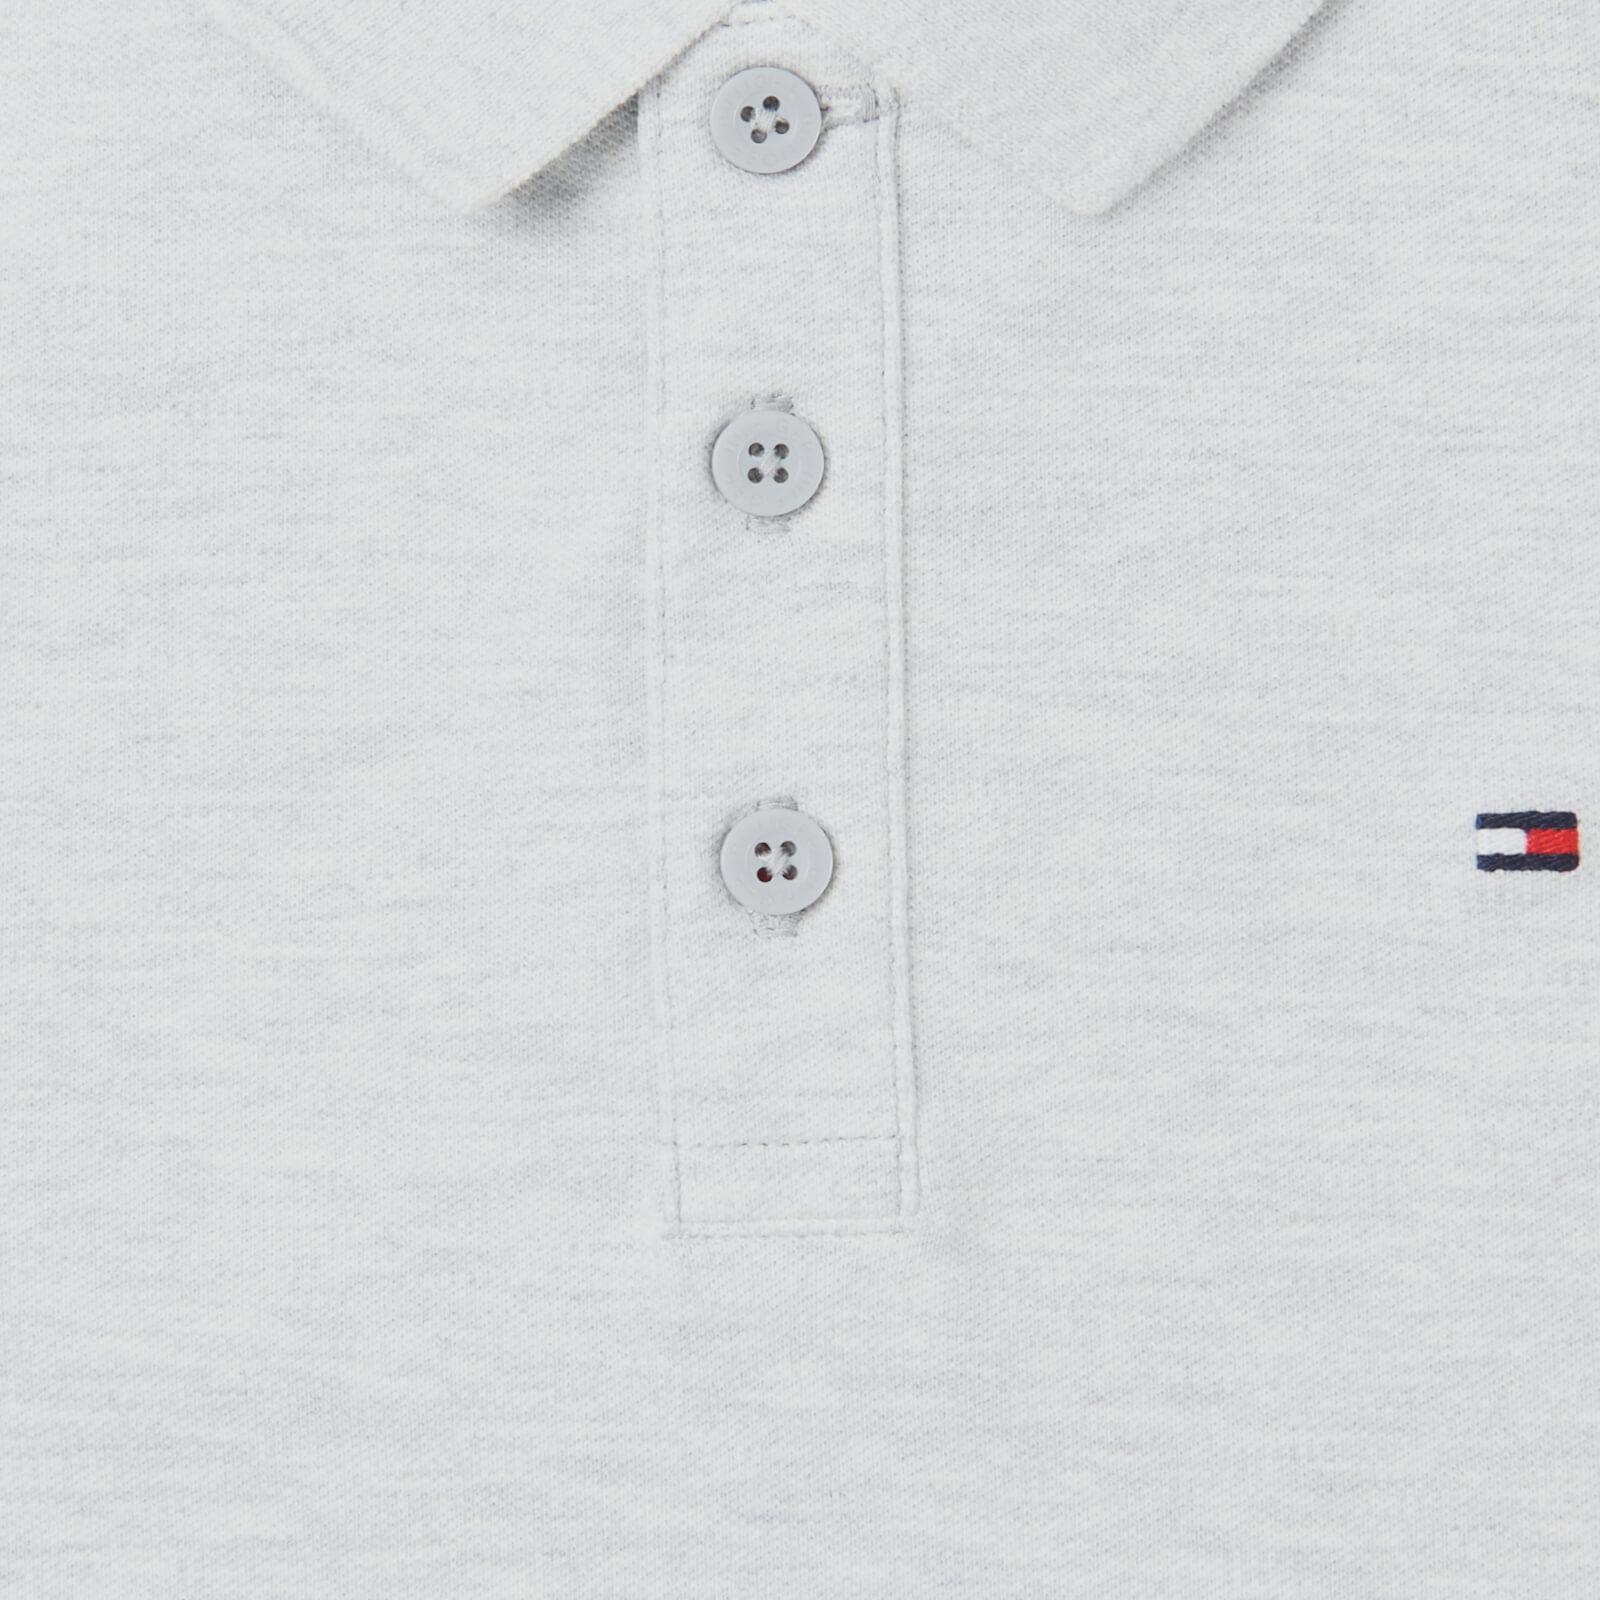 Tommy Hilfiger Boys' Slim Fit Polo-shirt - Light Grey Heather - 8 Years Kb0kb06538pz1 Childrens Clothing, Grey